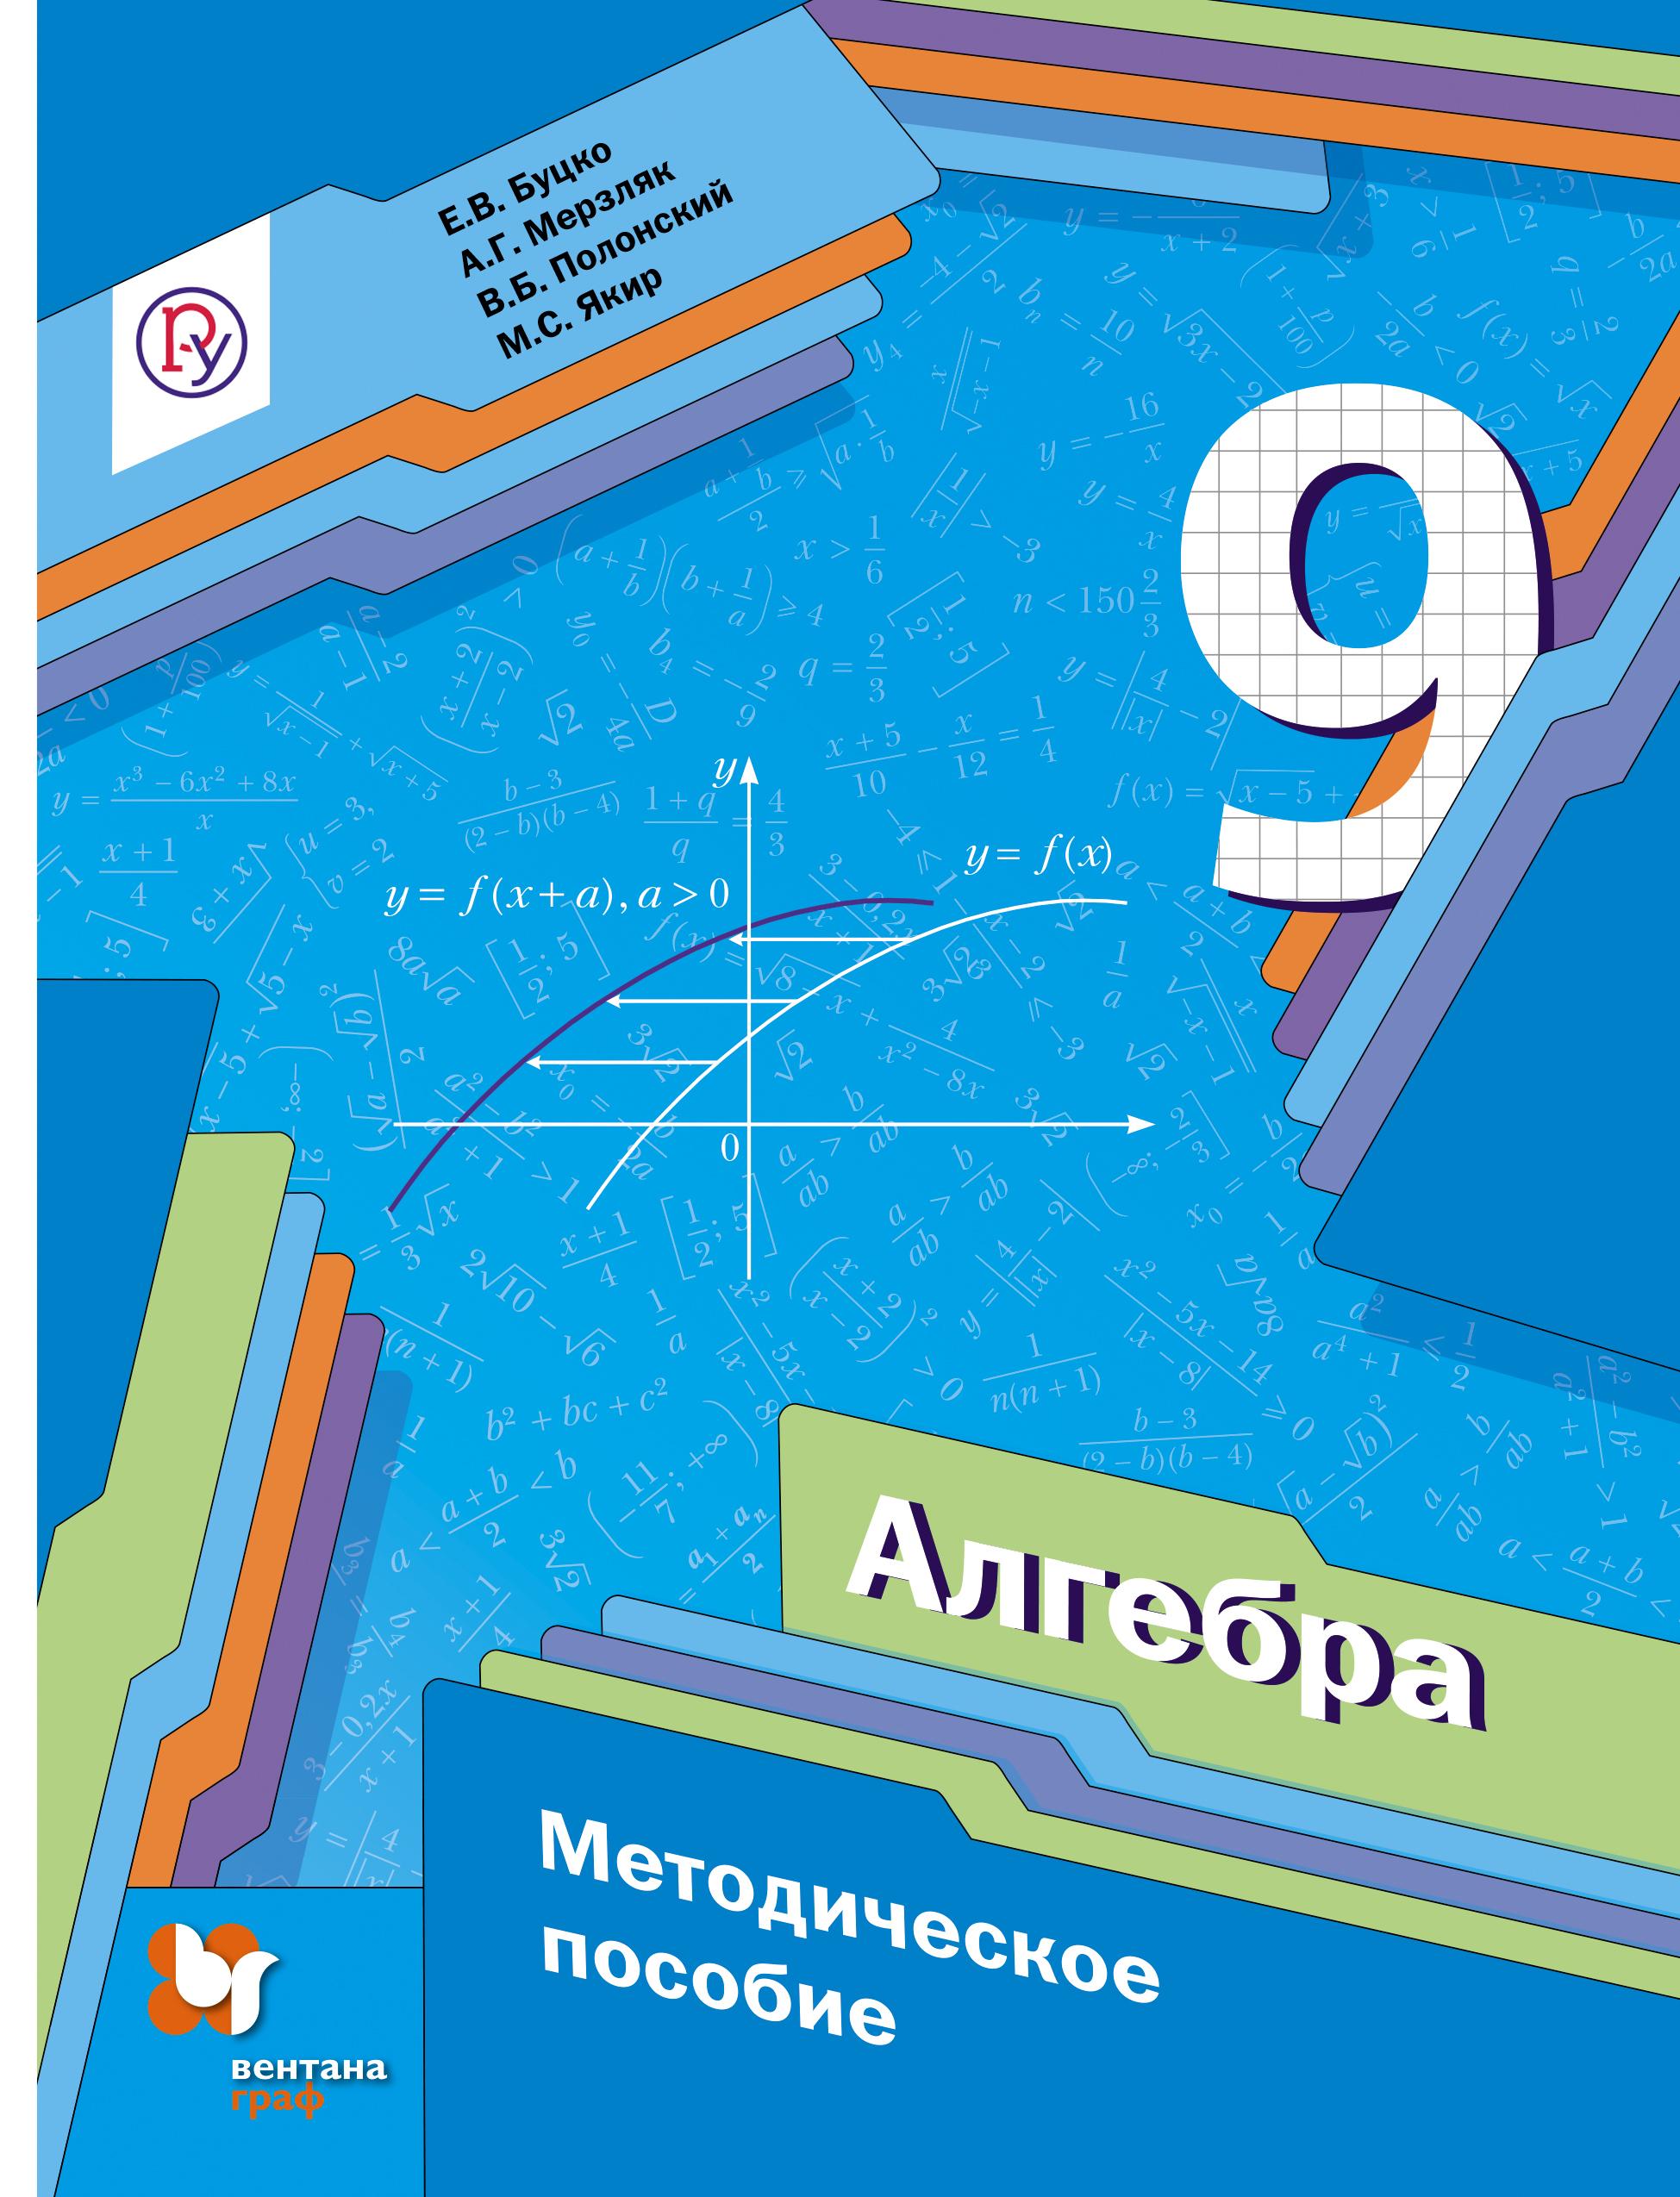 Алгебра. 9класс. Методическое пособие